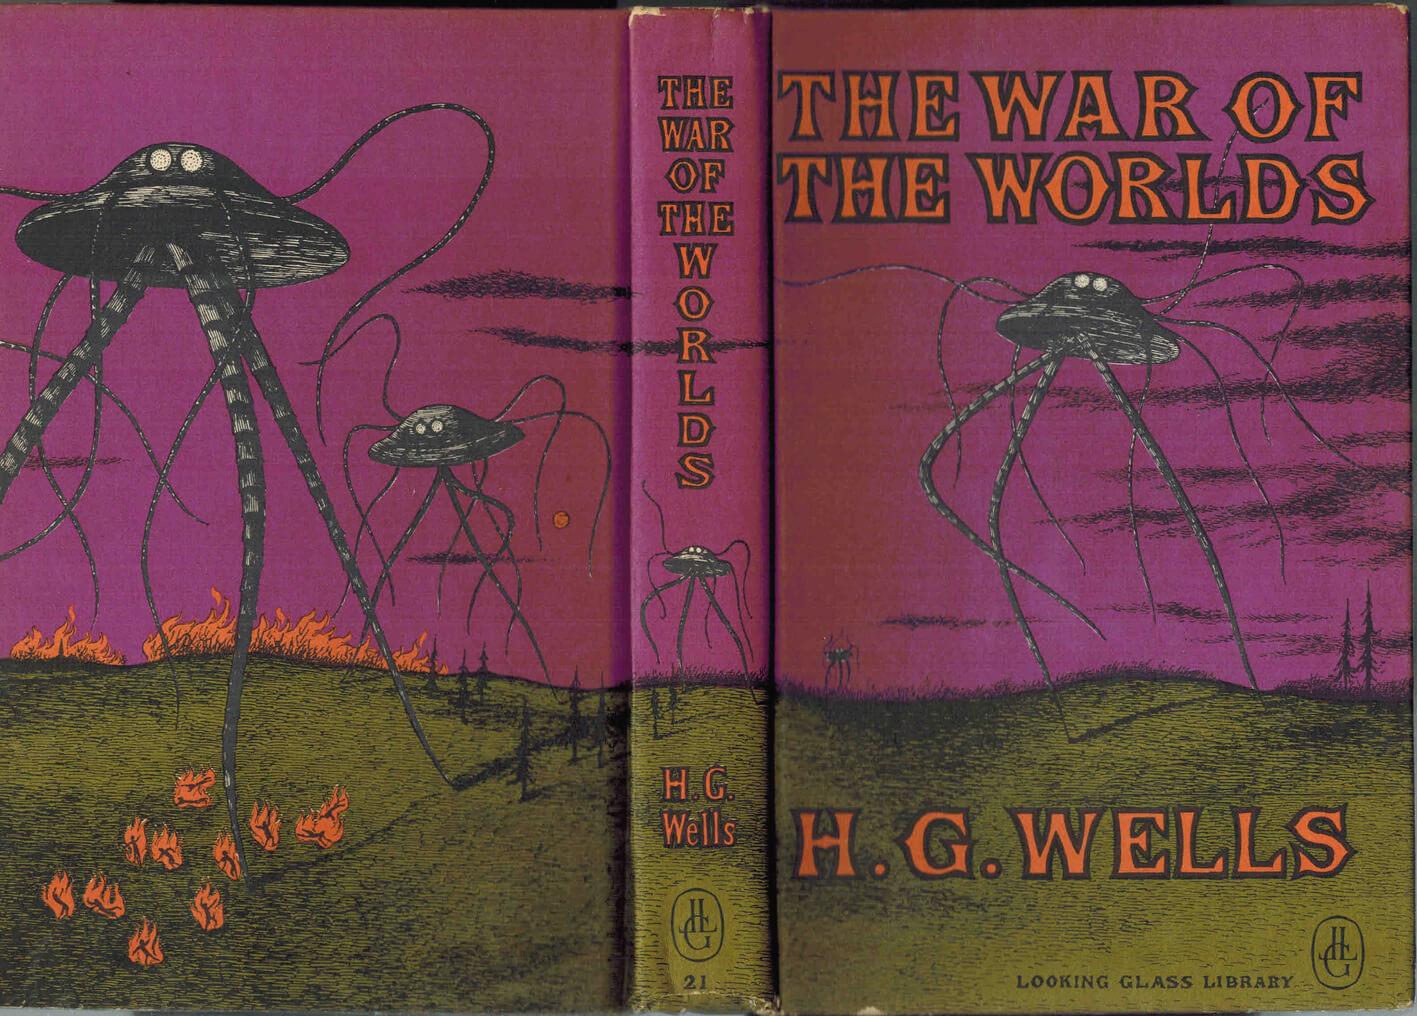 EdwardGorey-HG.Wells-WarOfTheWorlds-cover.jpg